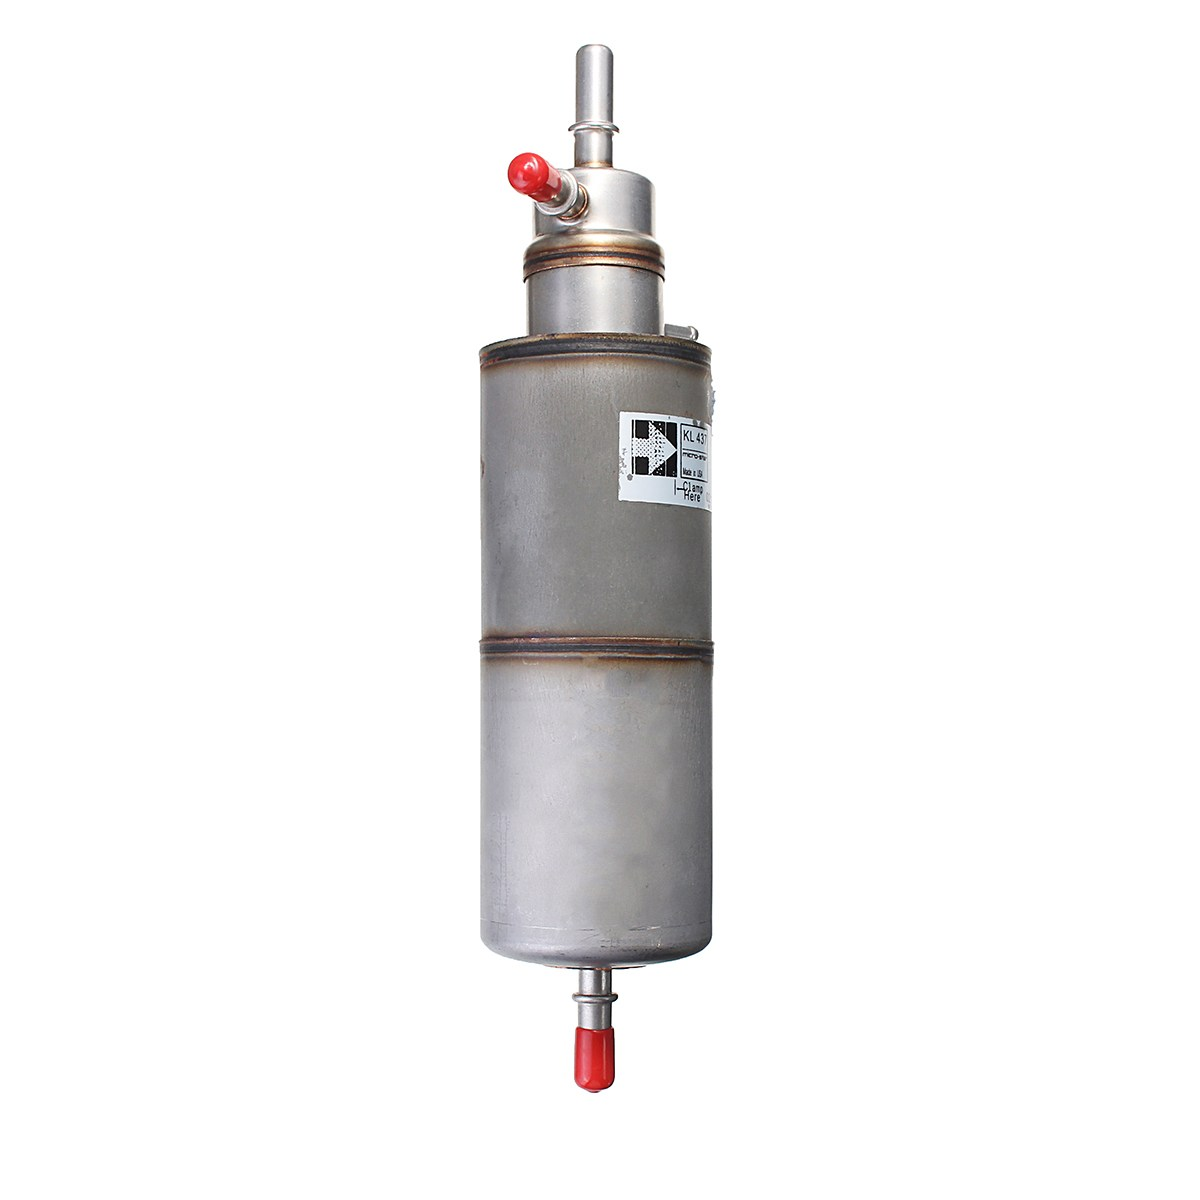 car oil fuel filter pressure regulator for mercedes benz ml55 for amg ml320 ml430 1634770701  [ 1200 x 1200 Pixel ]